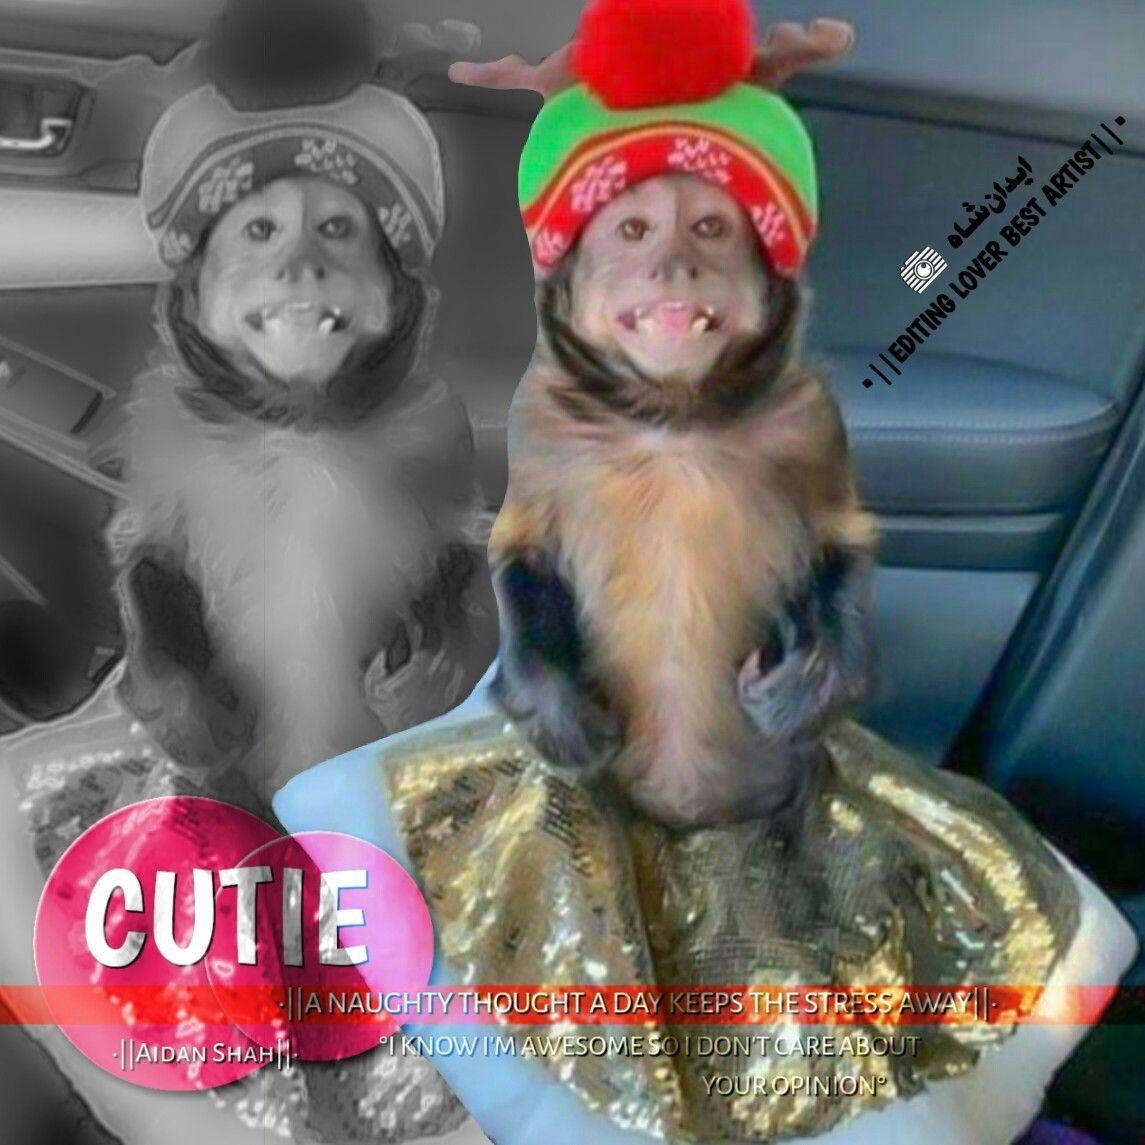 Pin By Aidan Shah On Funny Dps Cute Girl Photo Love Couple Photo Cute Kawaii Drawings